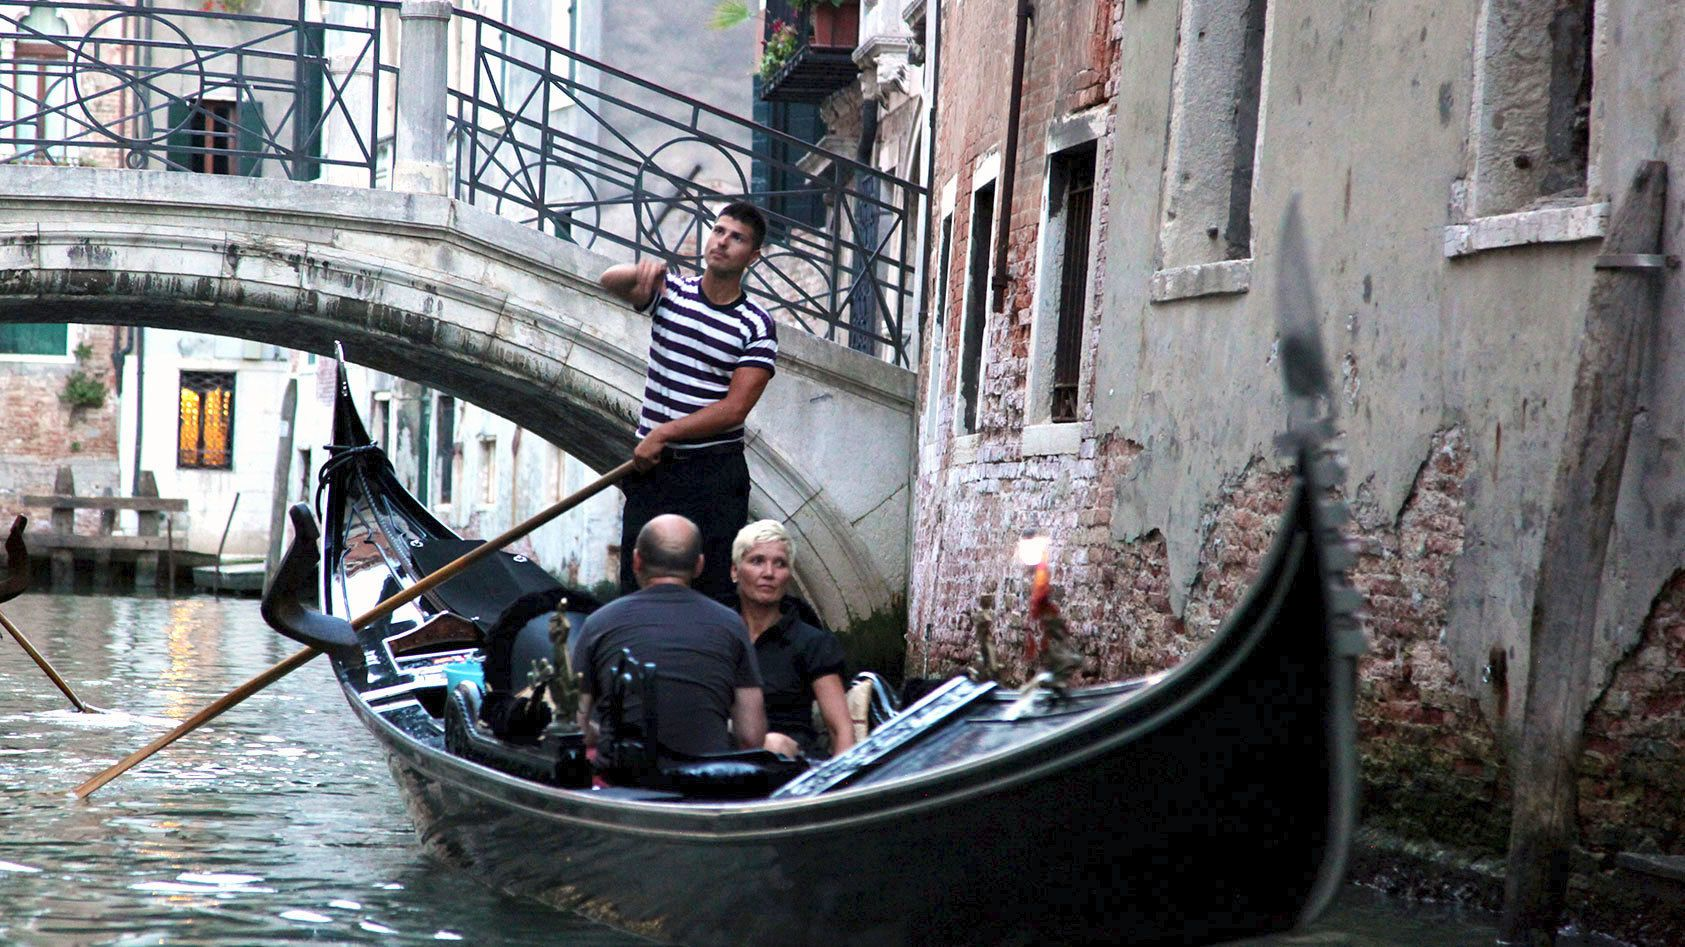 Gondola going under bridge in Venice Italy